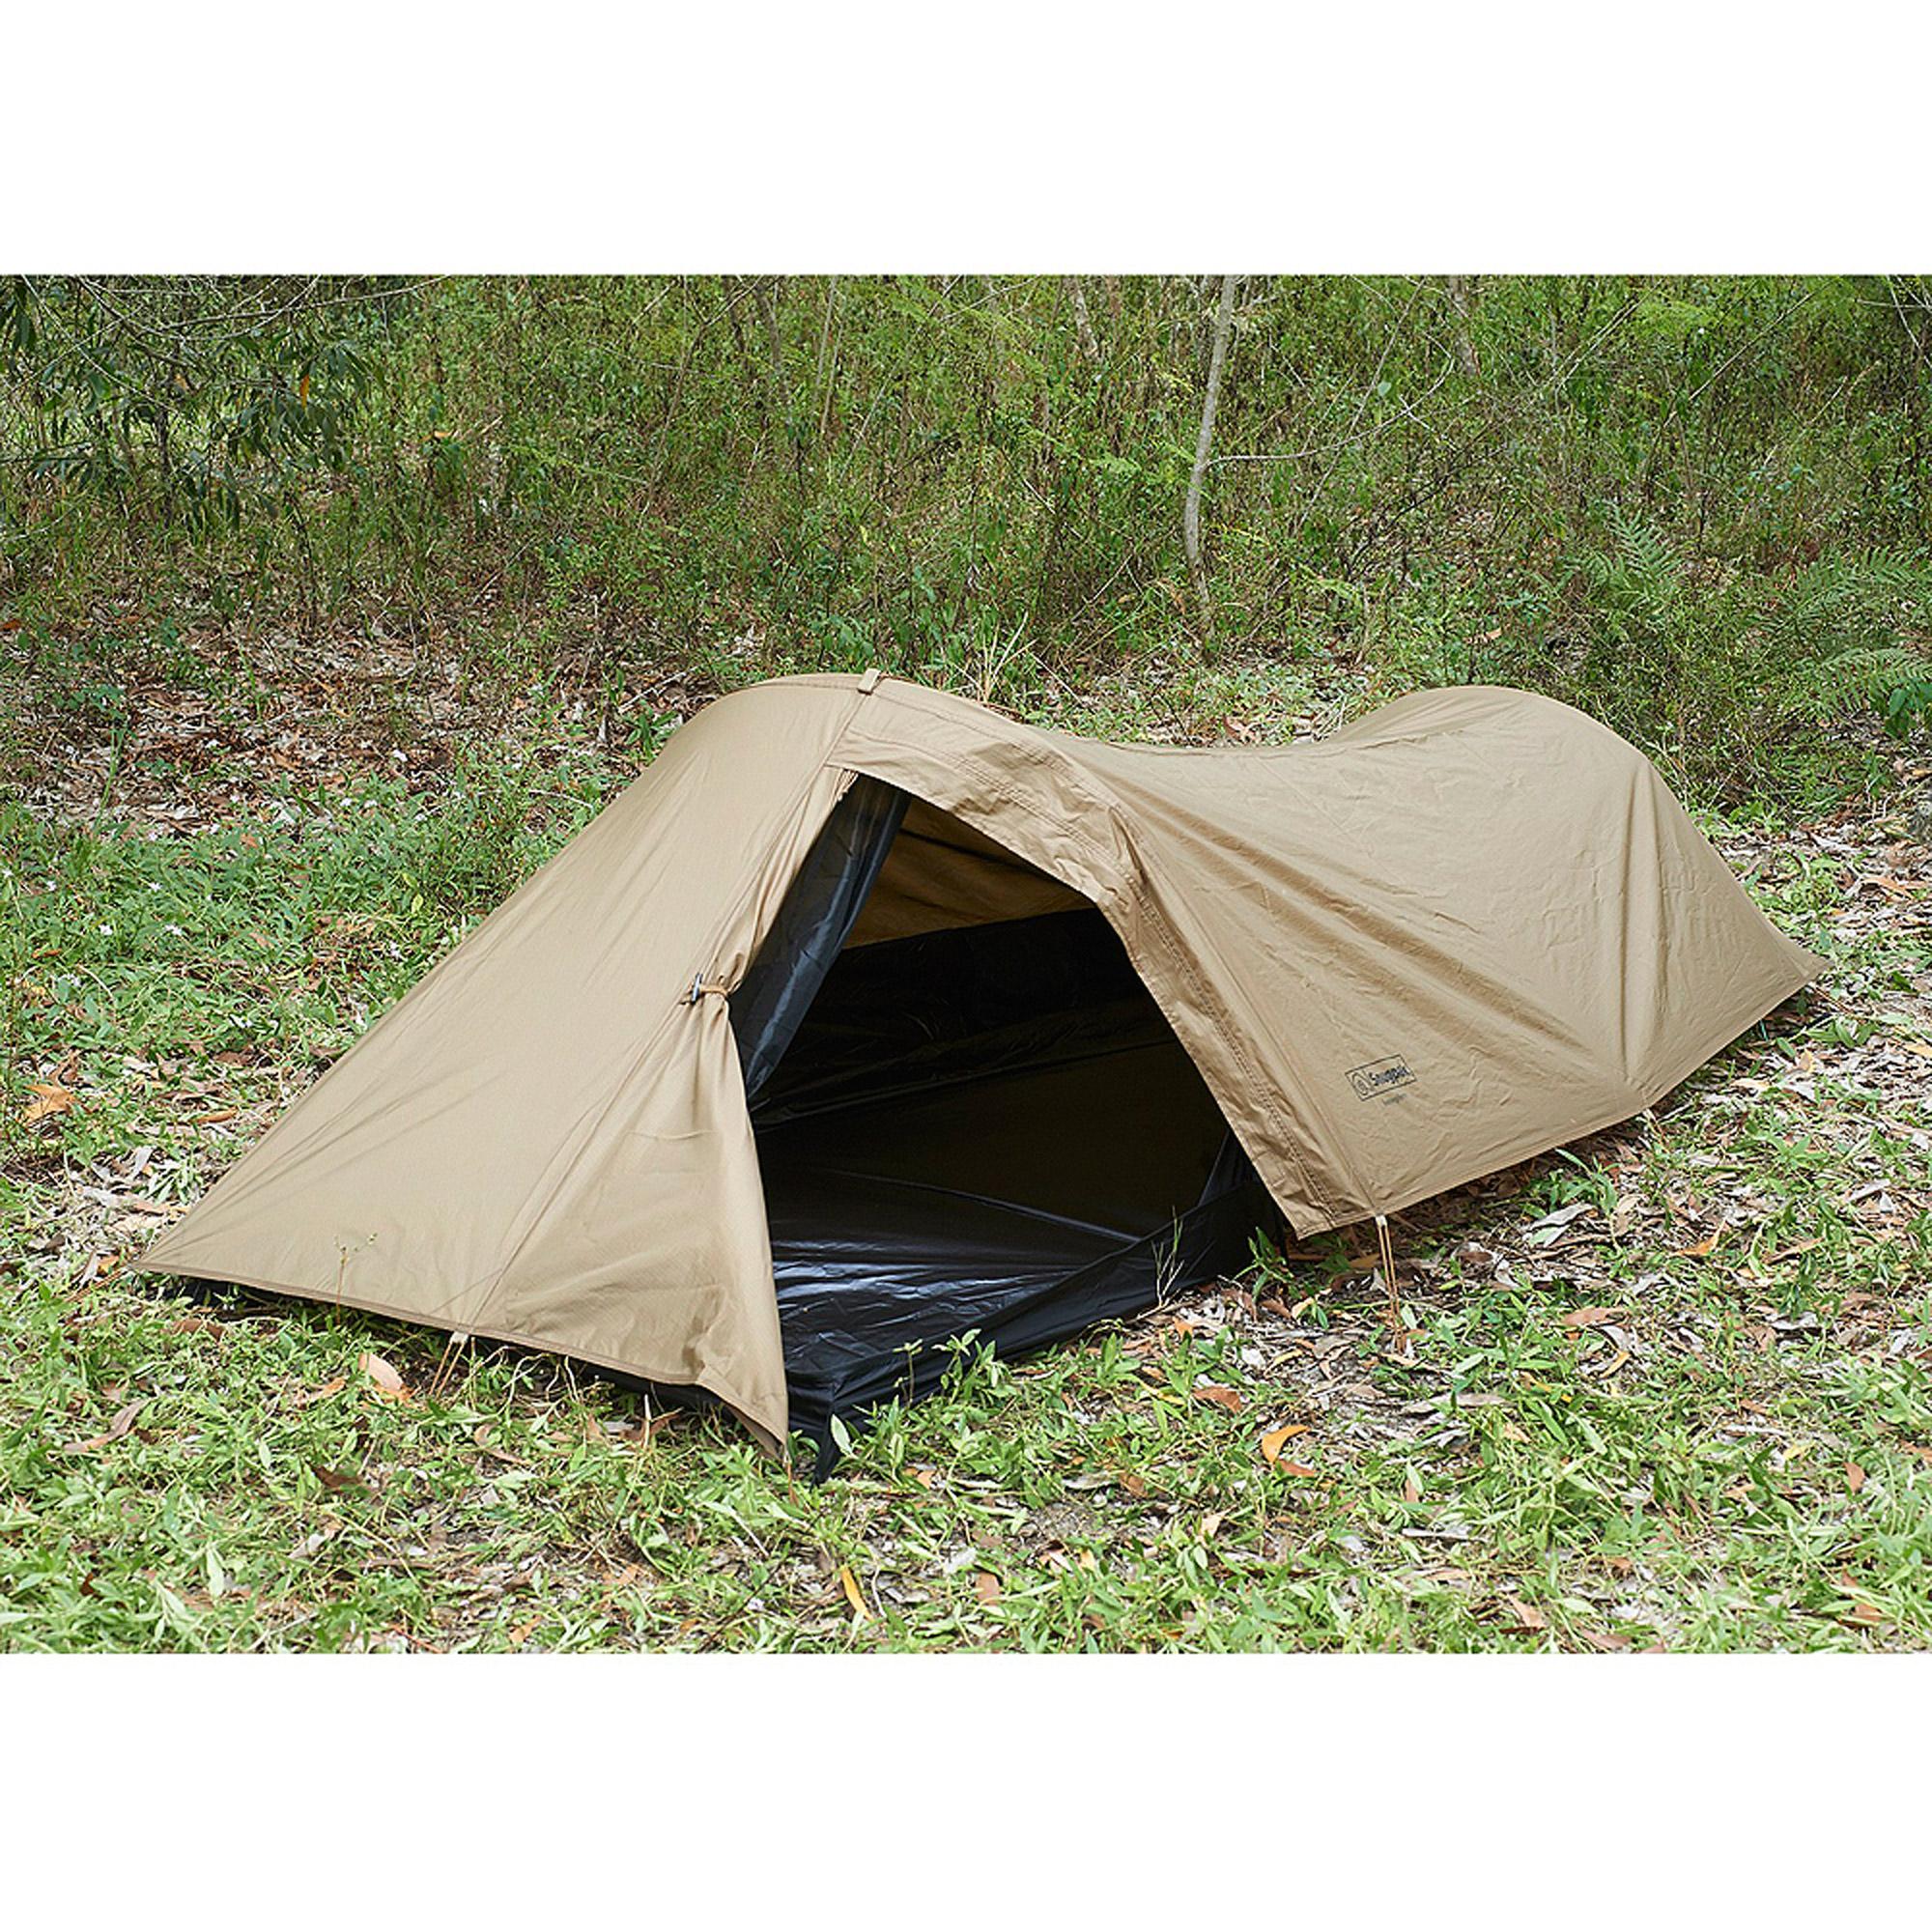 sc 1 st  Walmart & Snugpak Ionosphere 1-Person Tent - Walmart.com